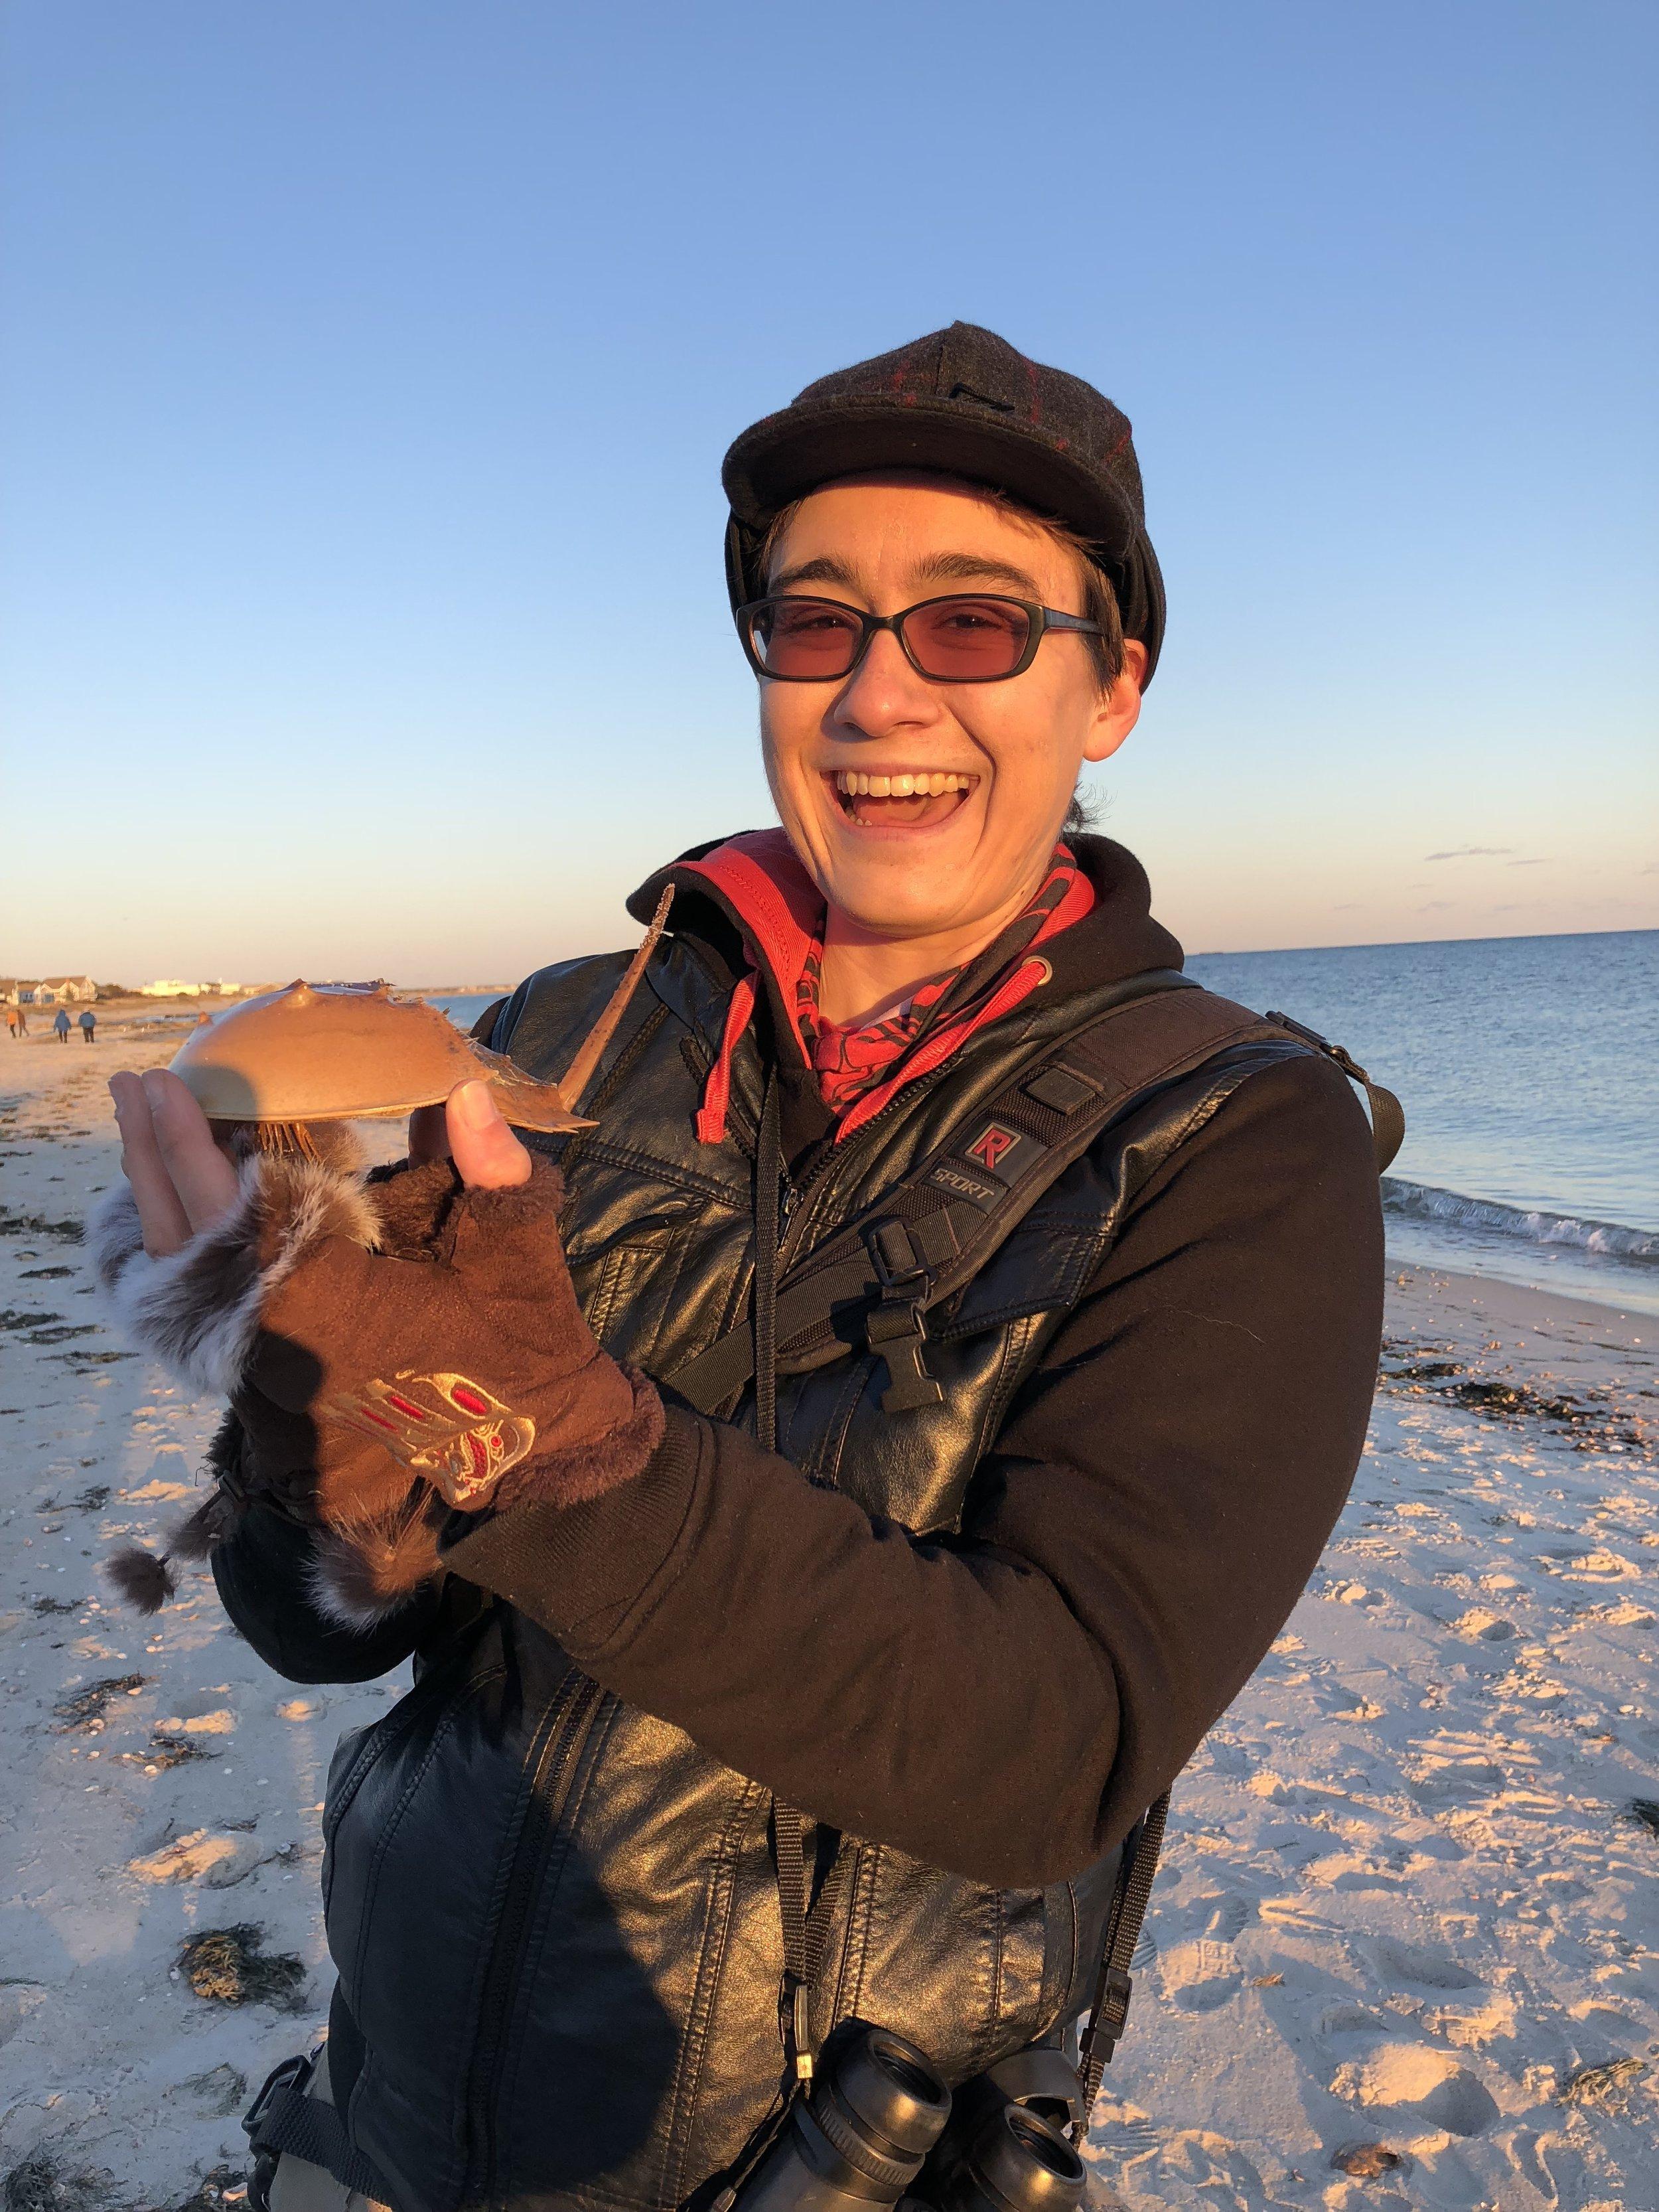 My new Horseshoe Crab shell friend!